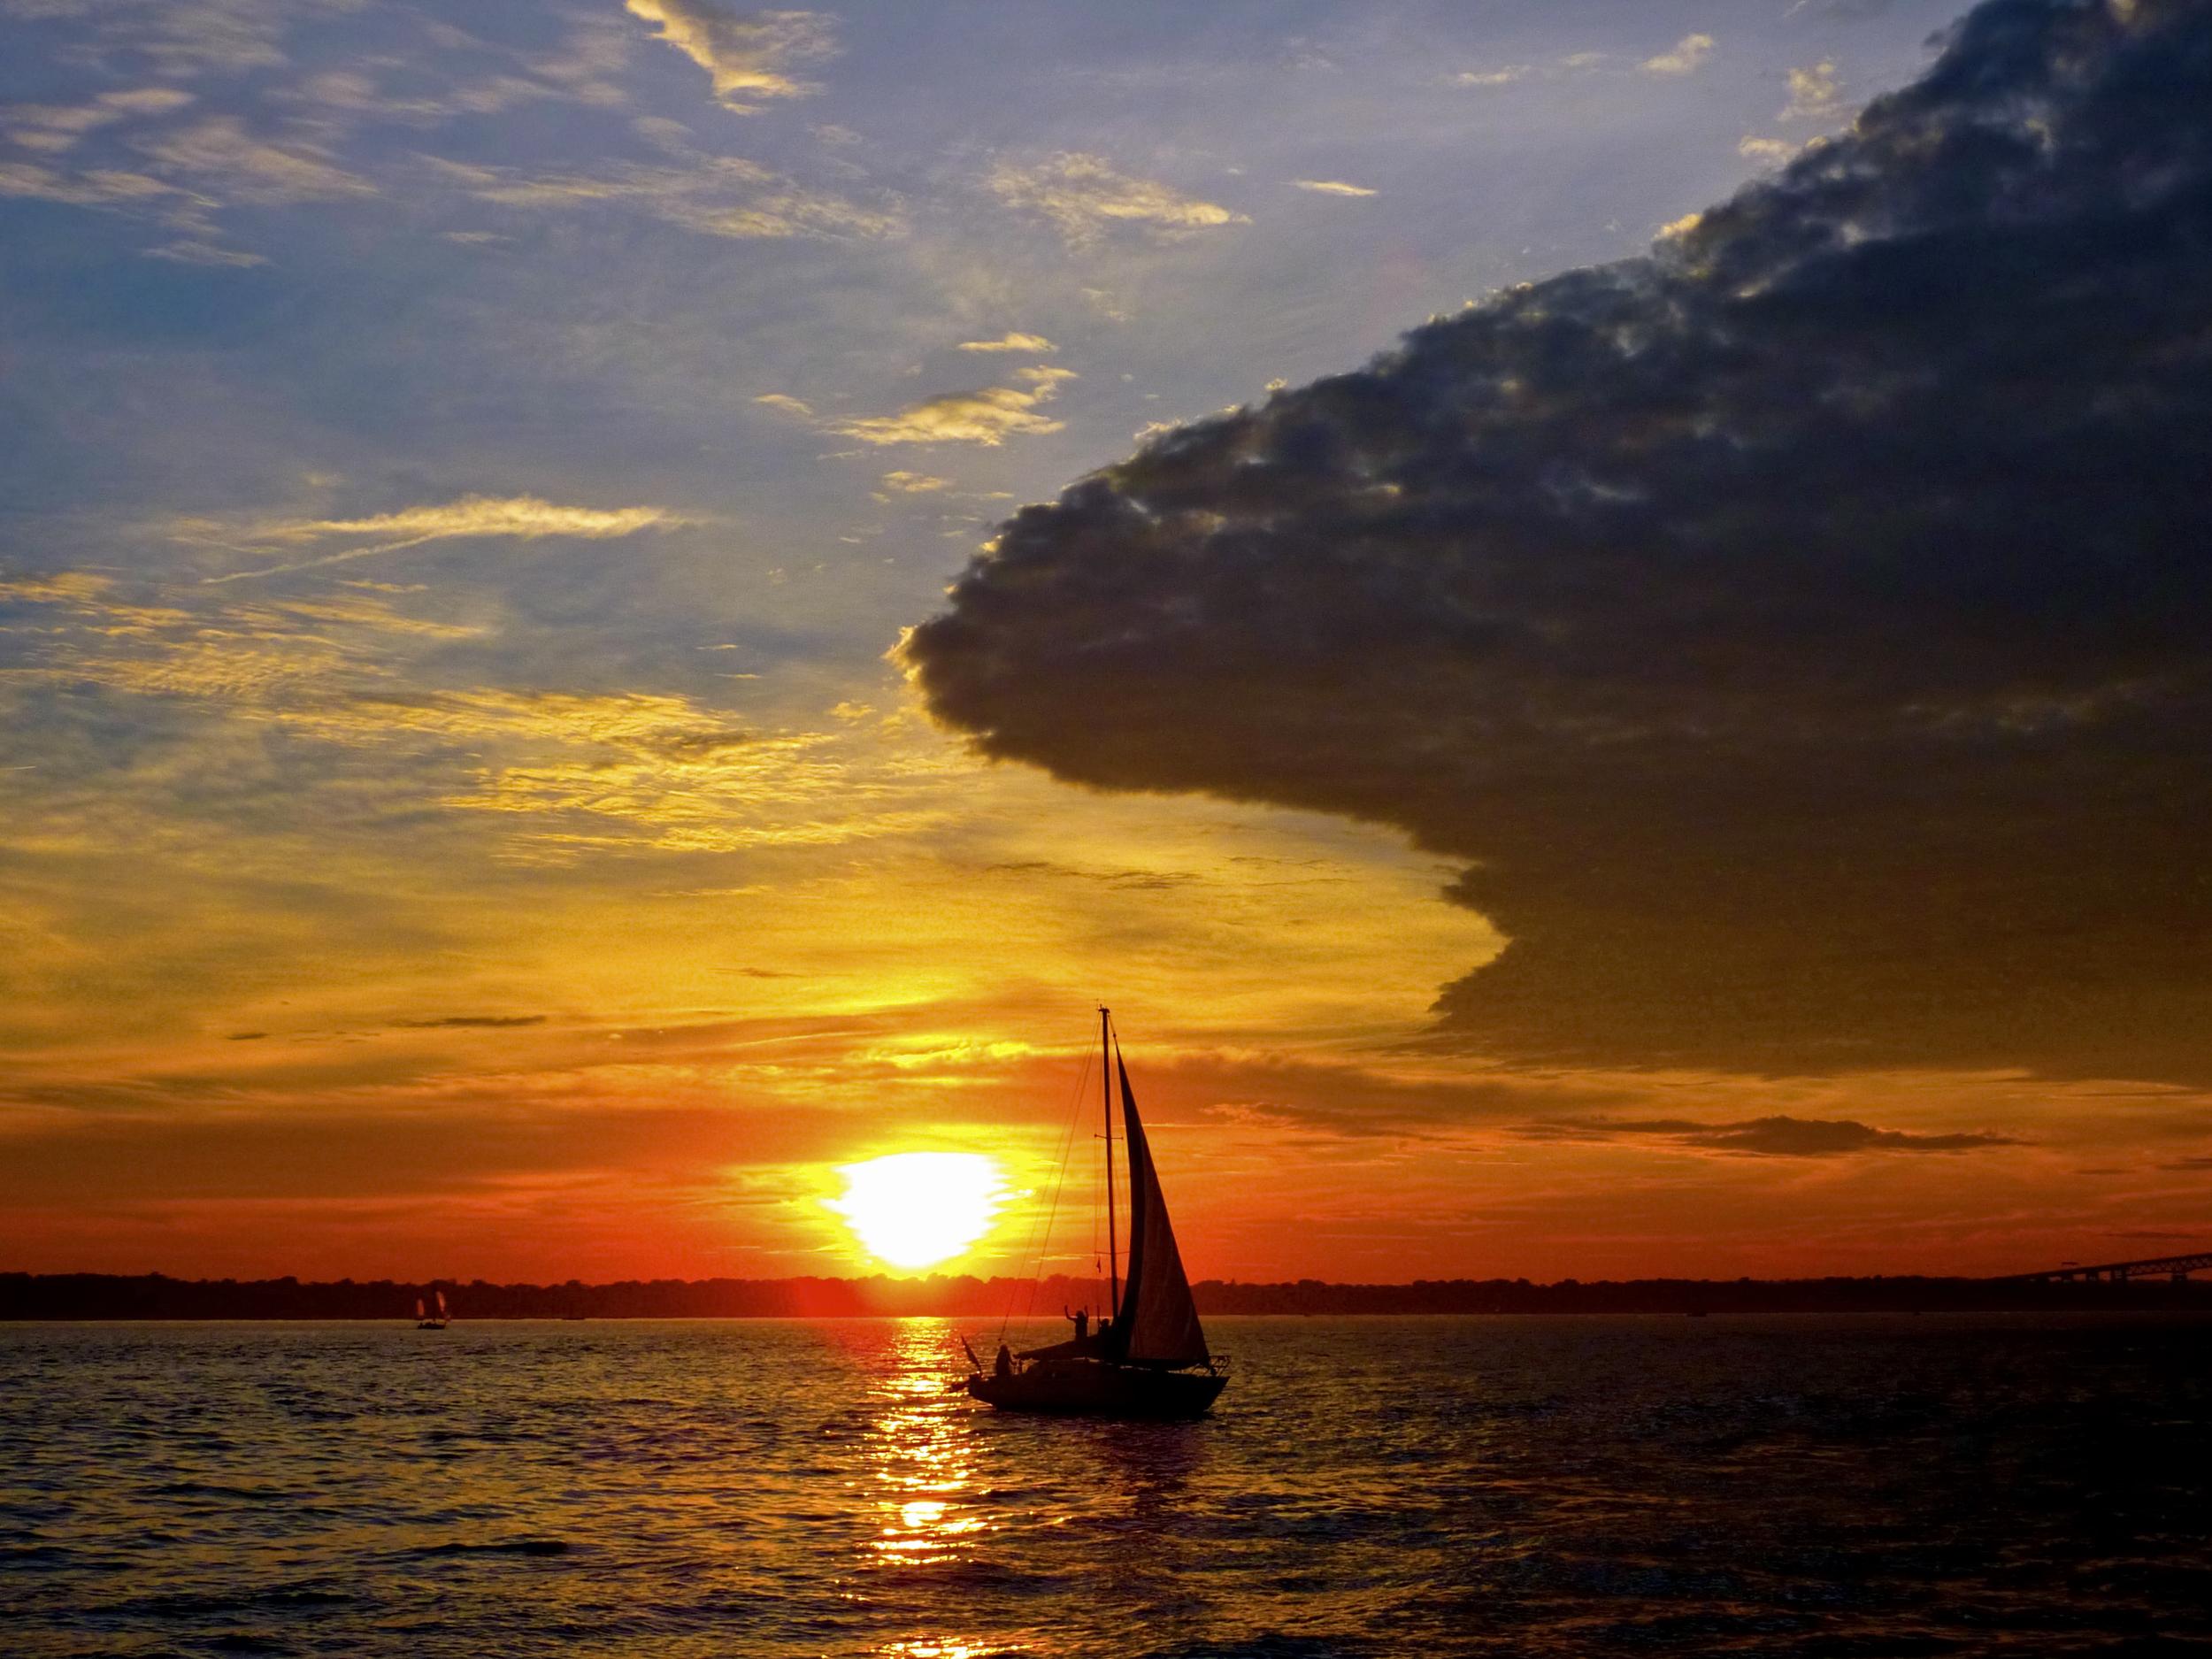 NE_SunsetSkyline_051.jpg